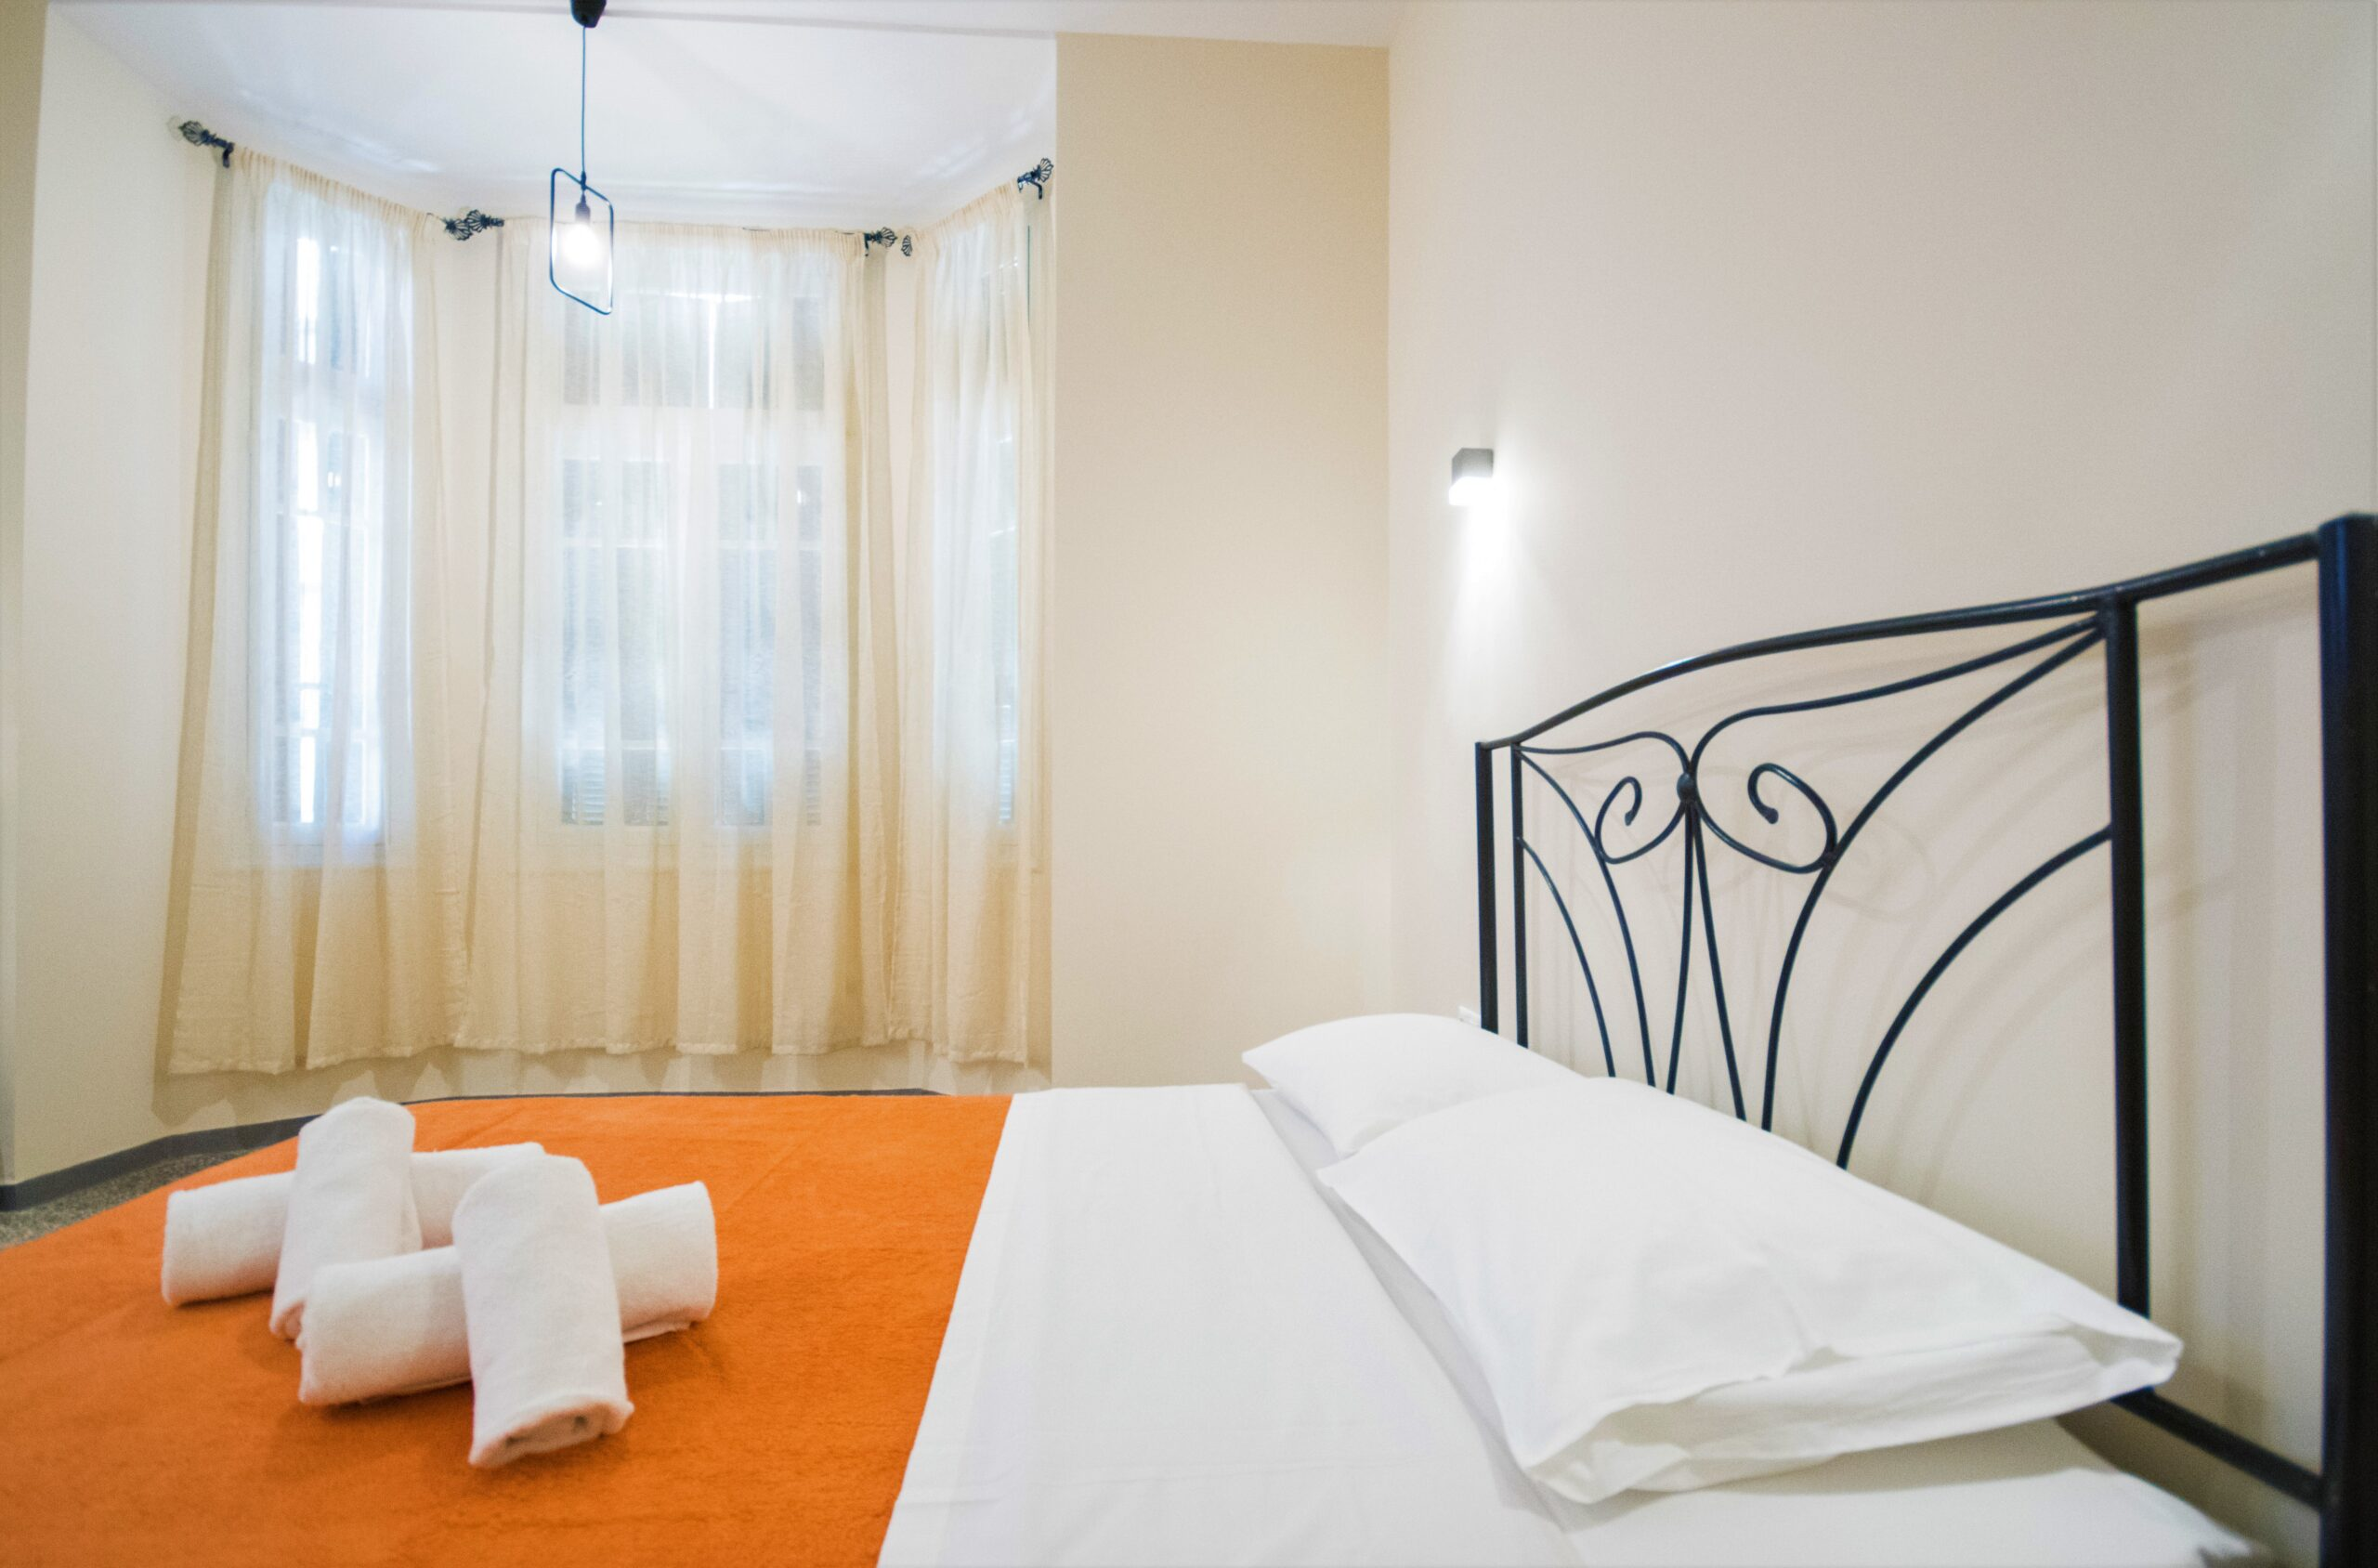 lights-windows-hotel-rooms